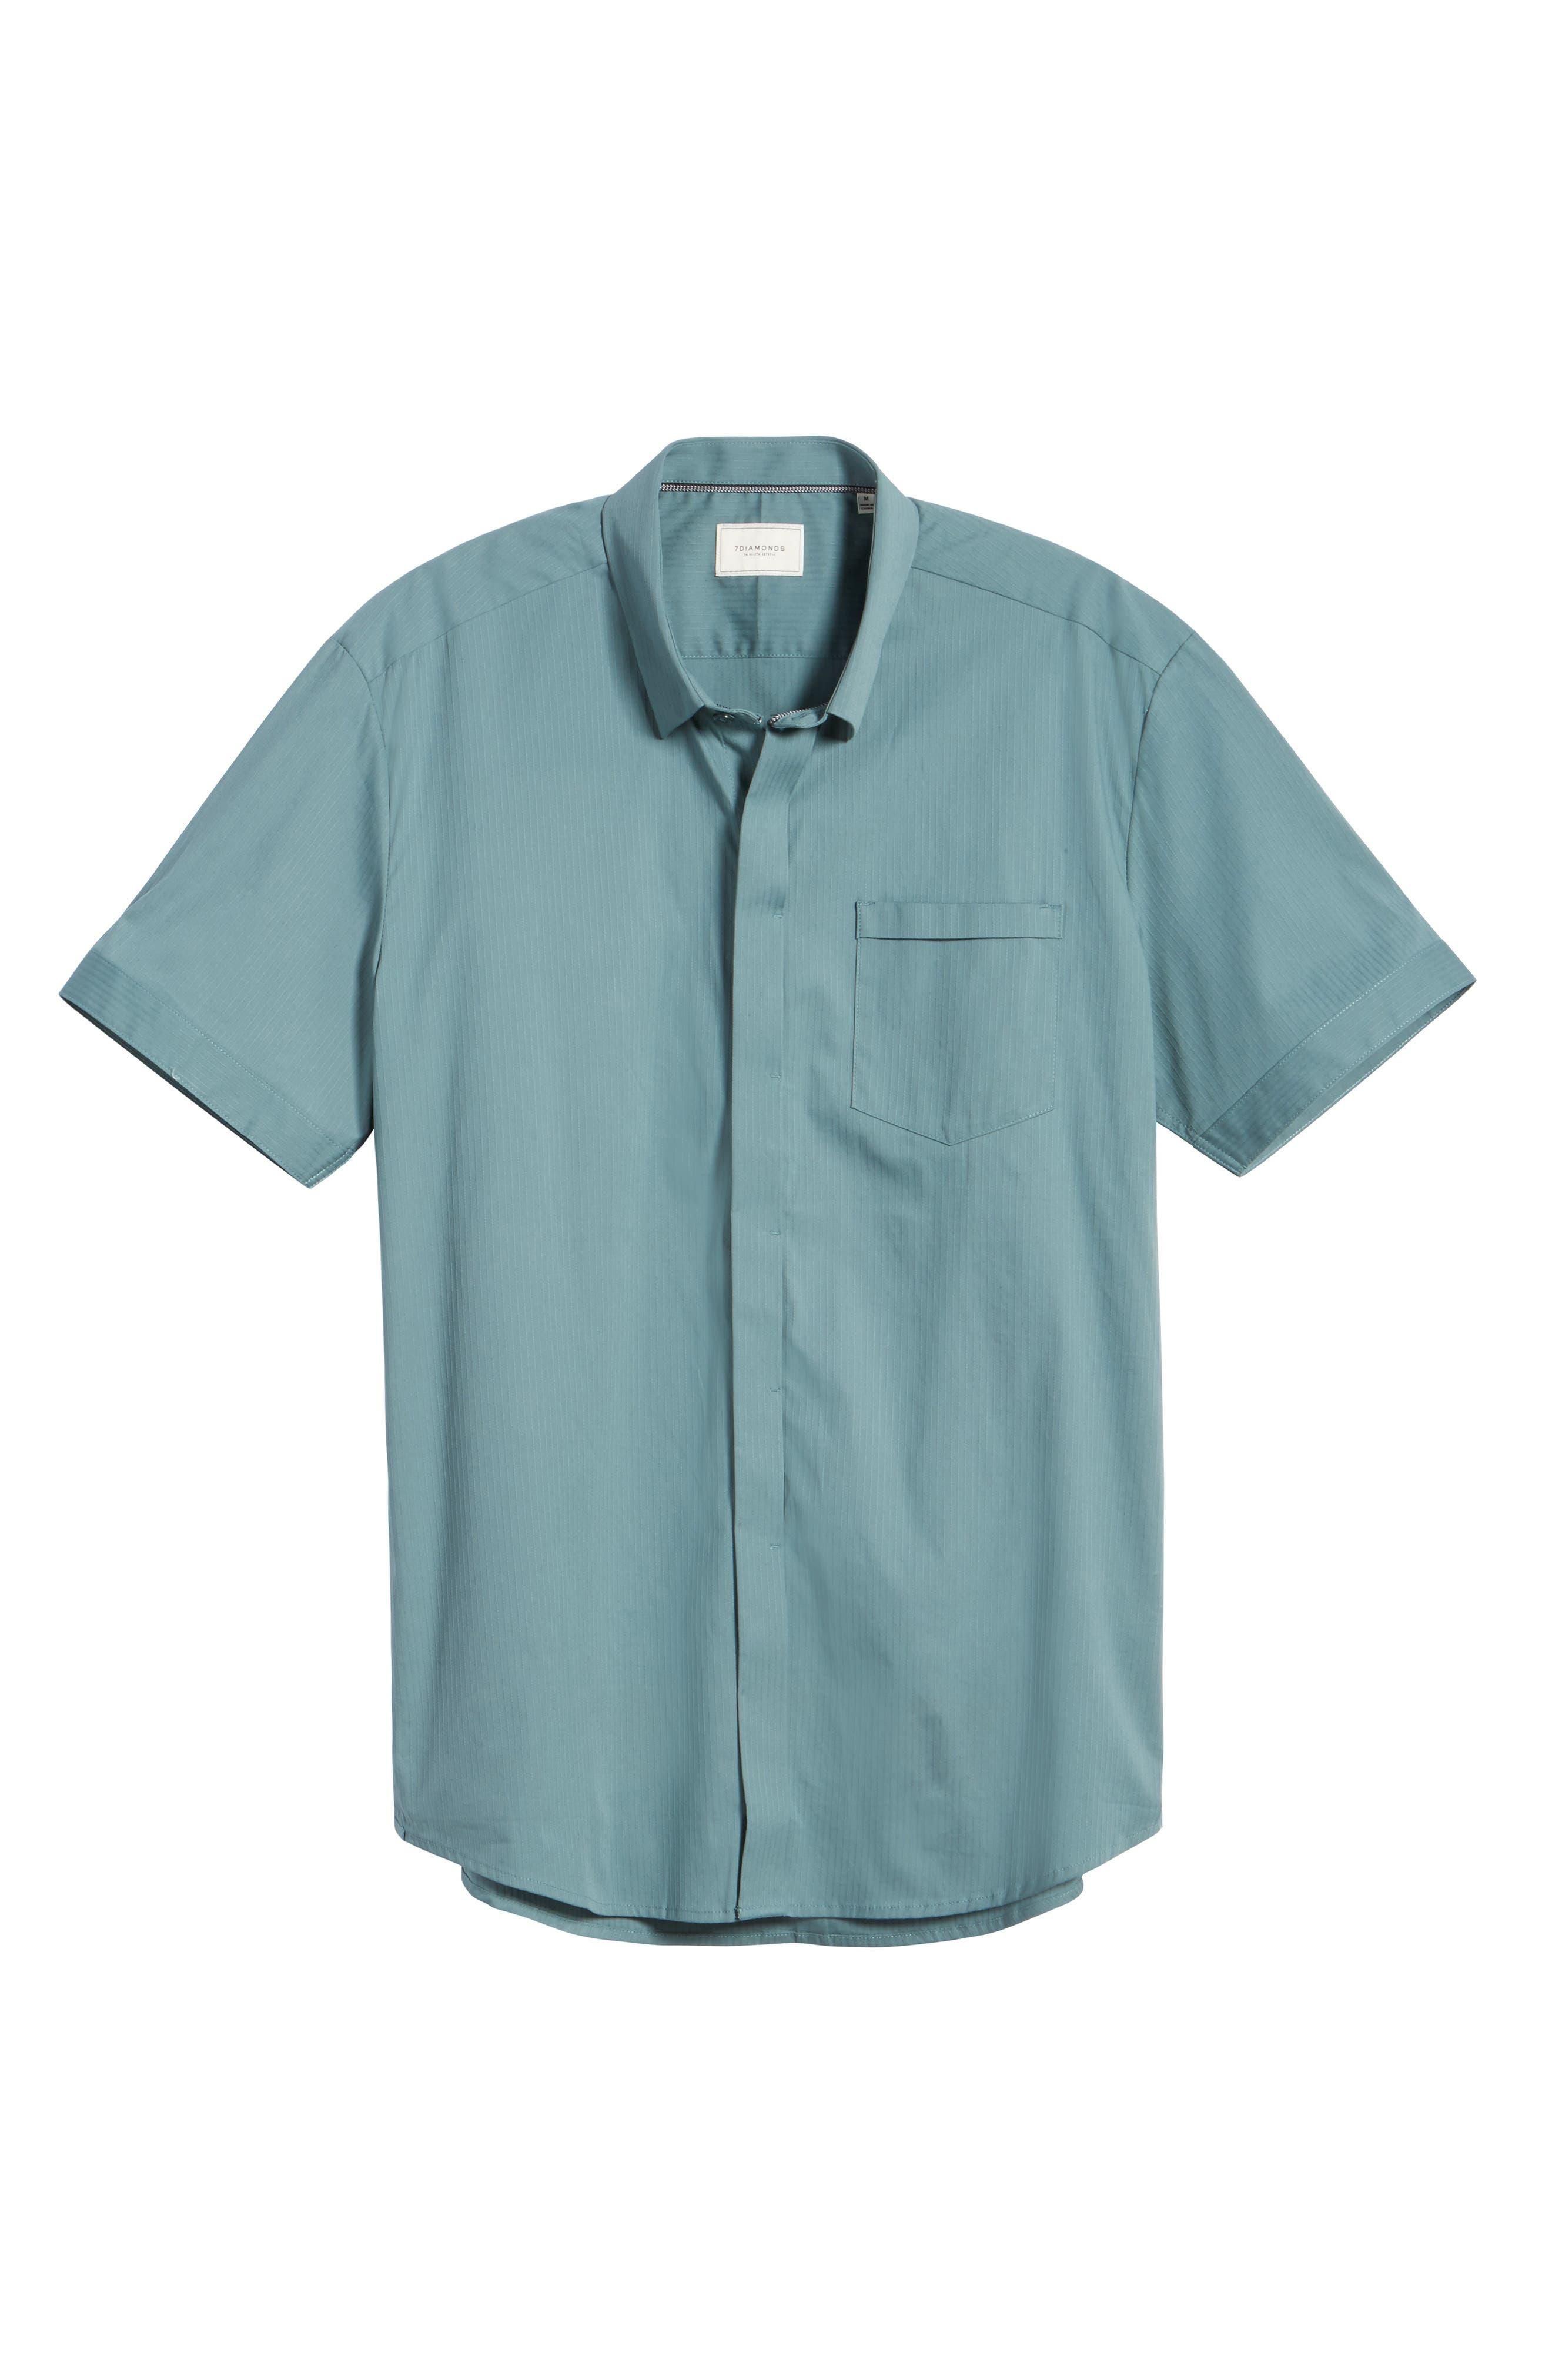 City Savior Woven Shirt,                             Alternate thumbnail 6, color,                             Stormy Sea